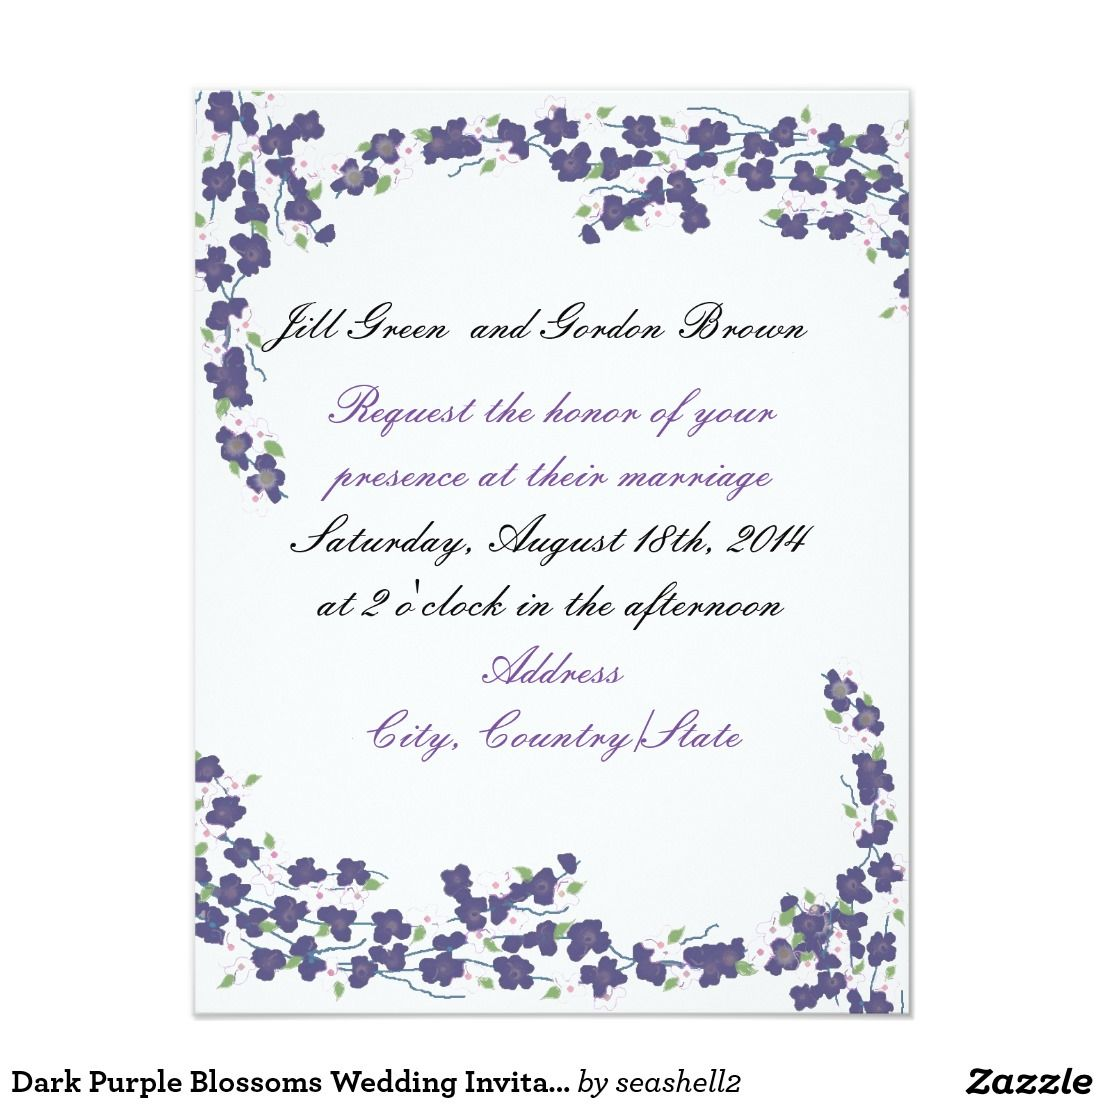 Dark Purple Blossoms Wedding Invitation | Dark purple, Weddings and ...